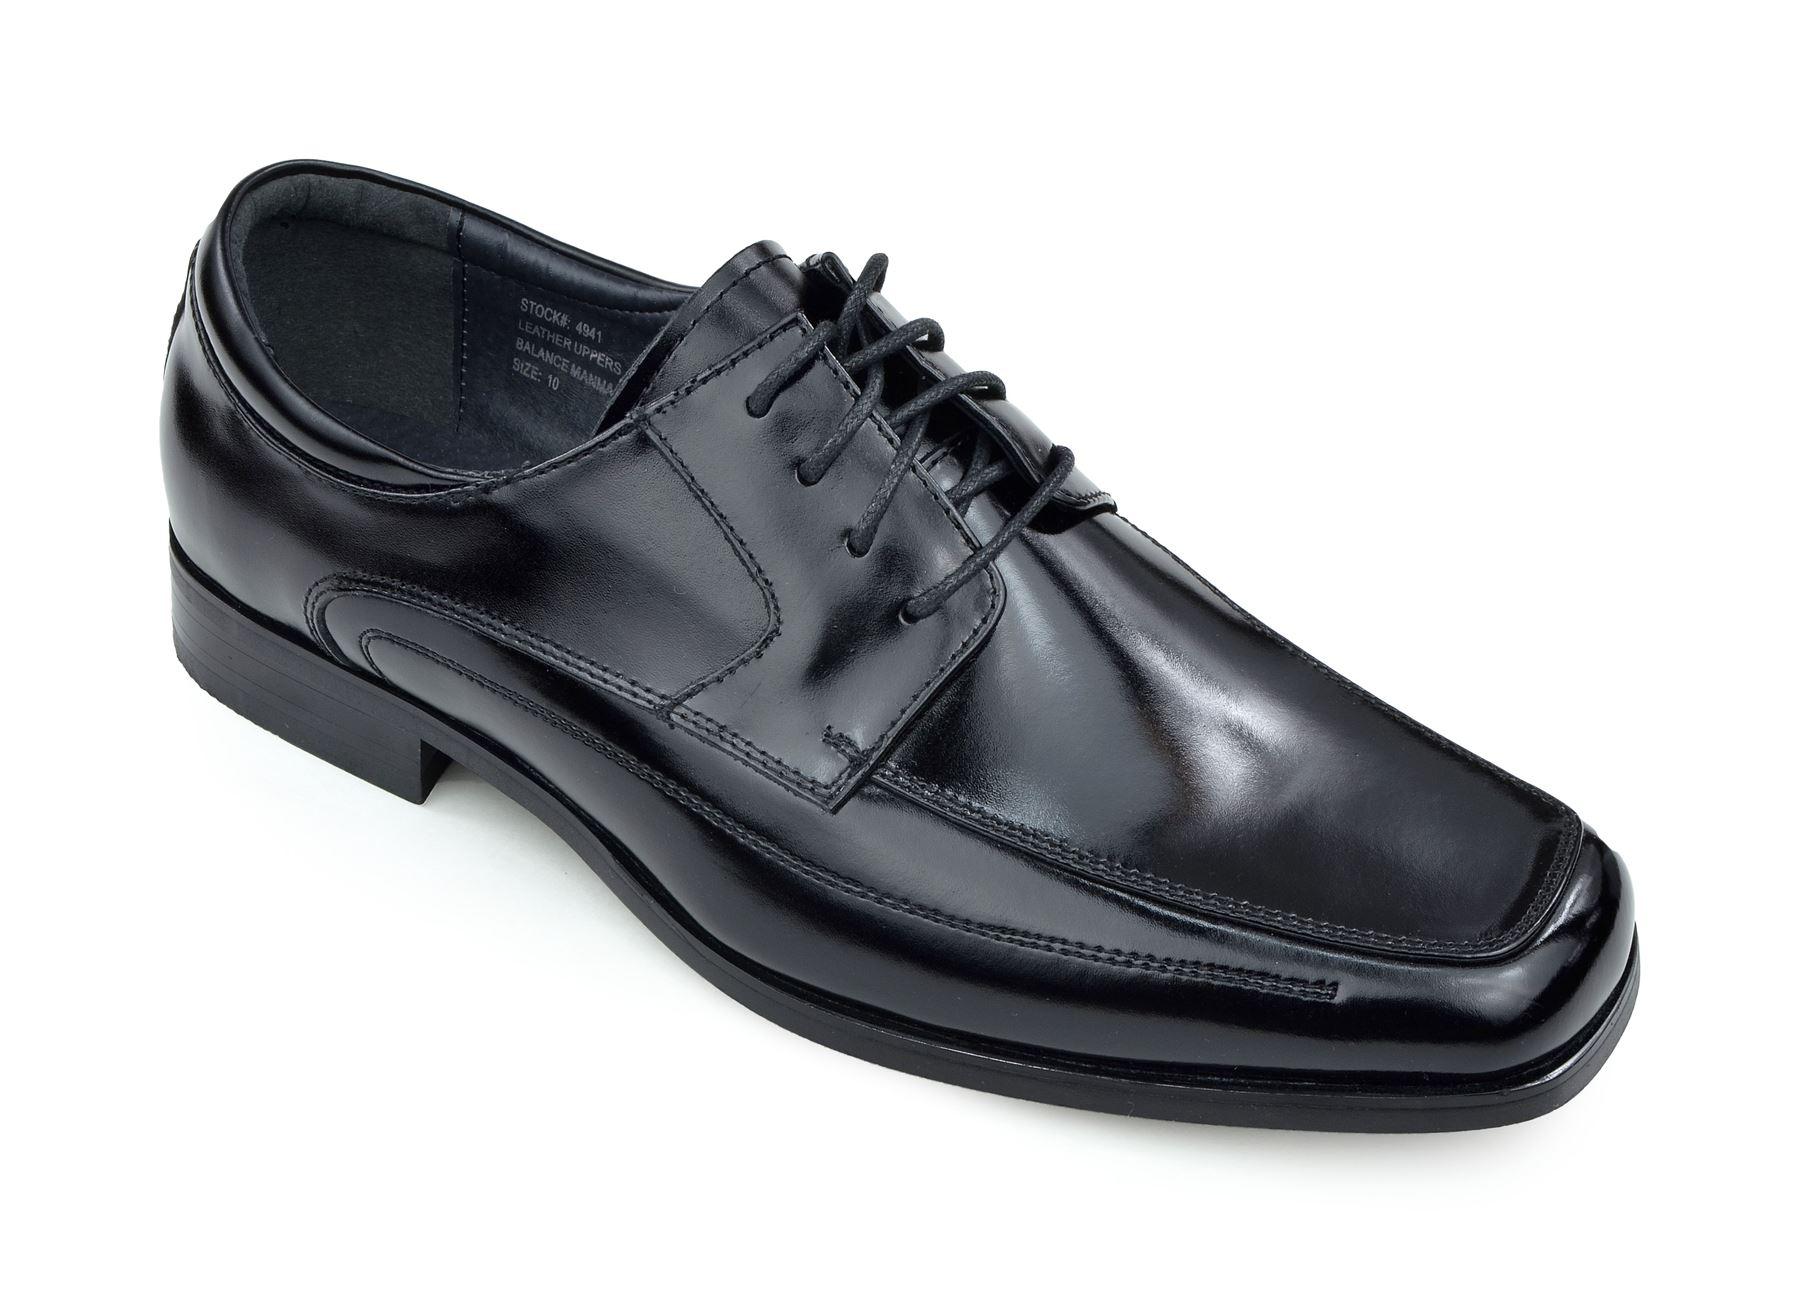 Moda Di Raza - Men's Oxford Lace Dress Shoes Sleek Trendy Light Shine - Black/10